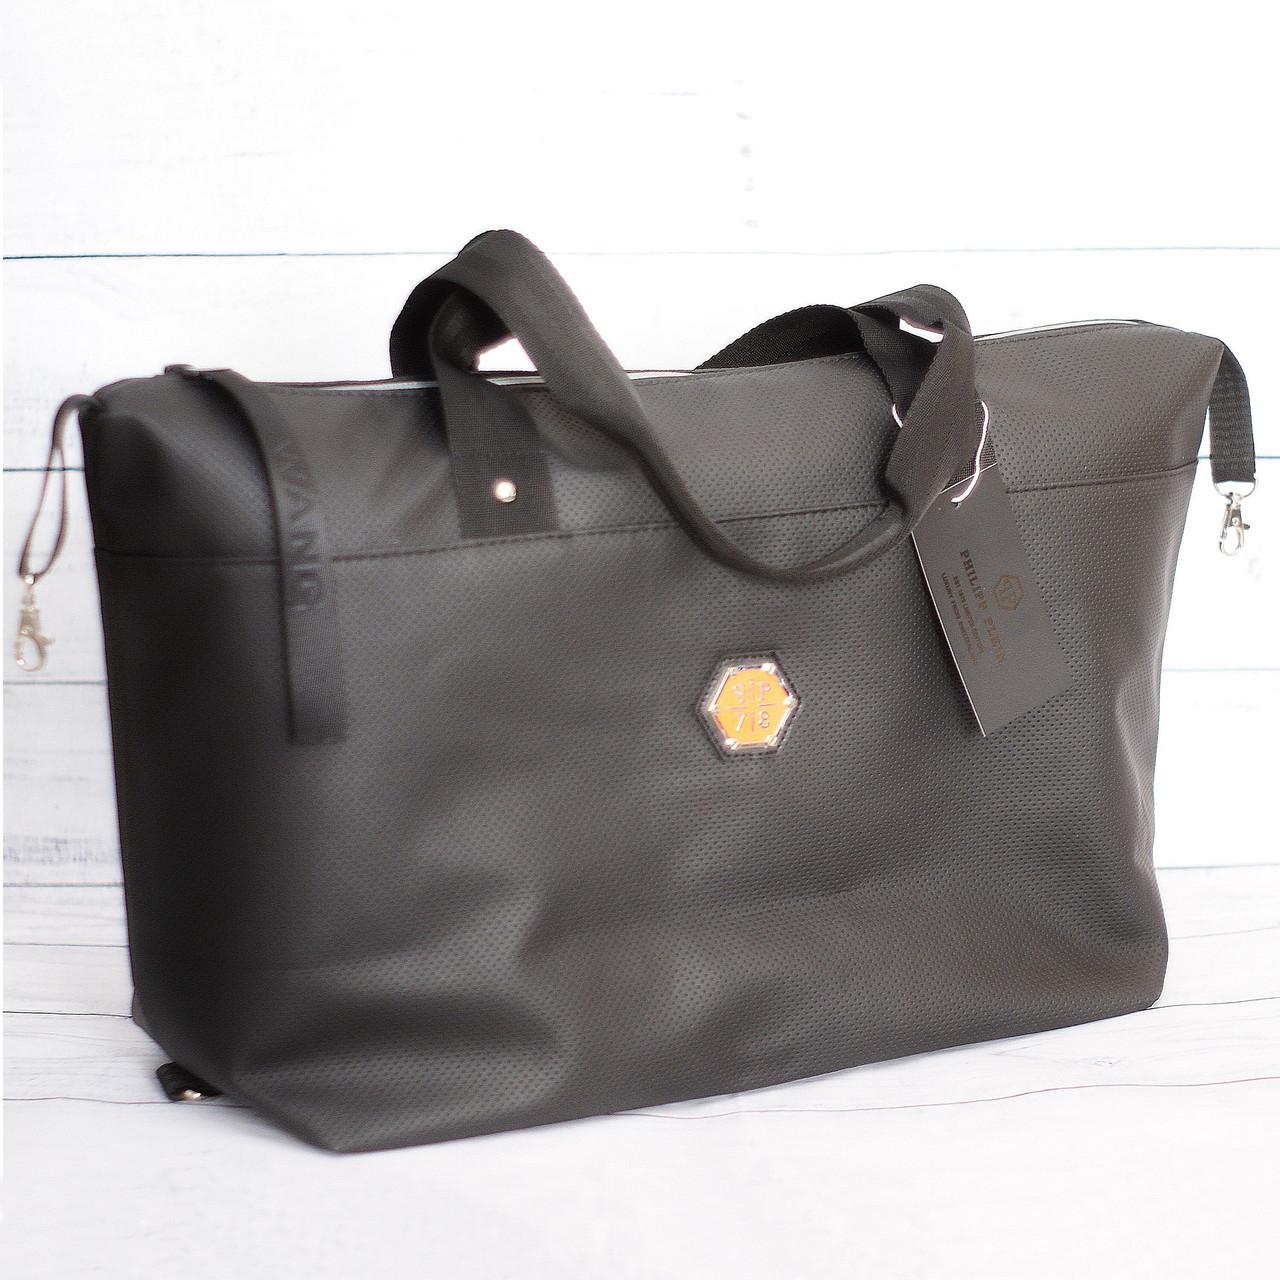 Спортивная сумка в стиле Philipp Plein (Филип Плейн), черная ( код: IBG185B )